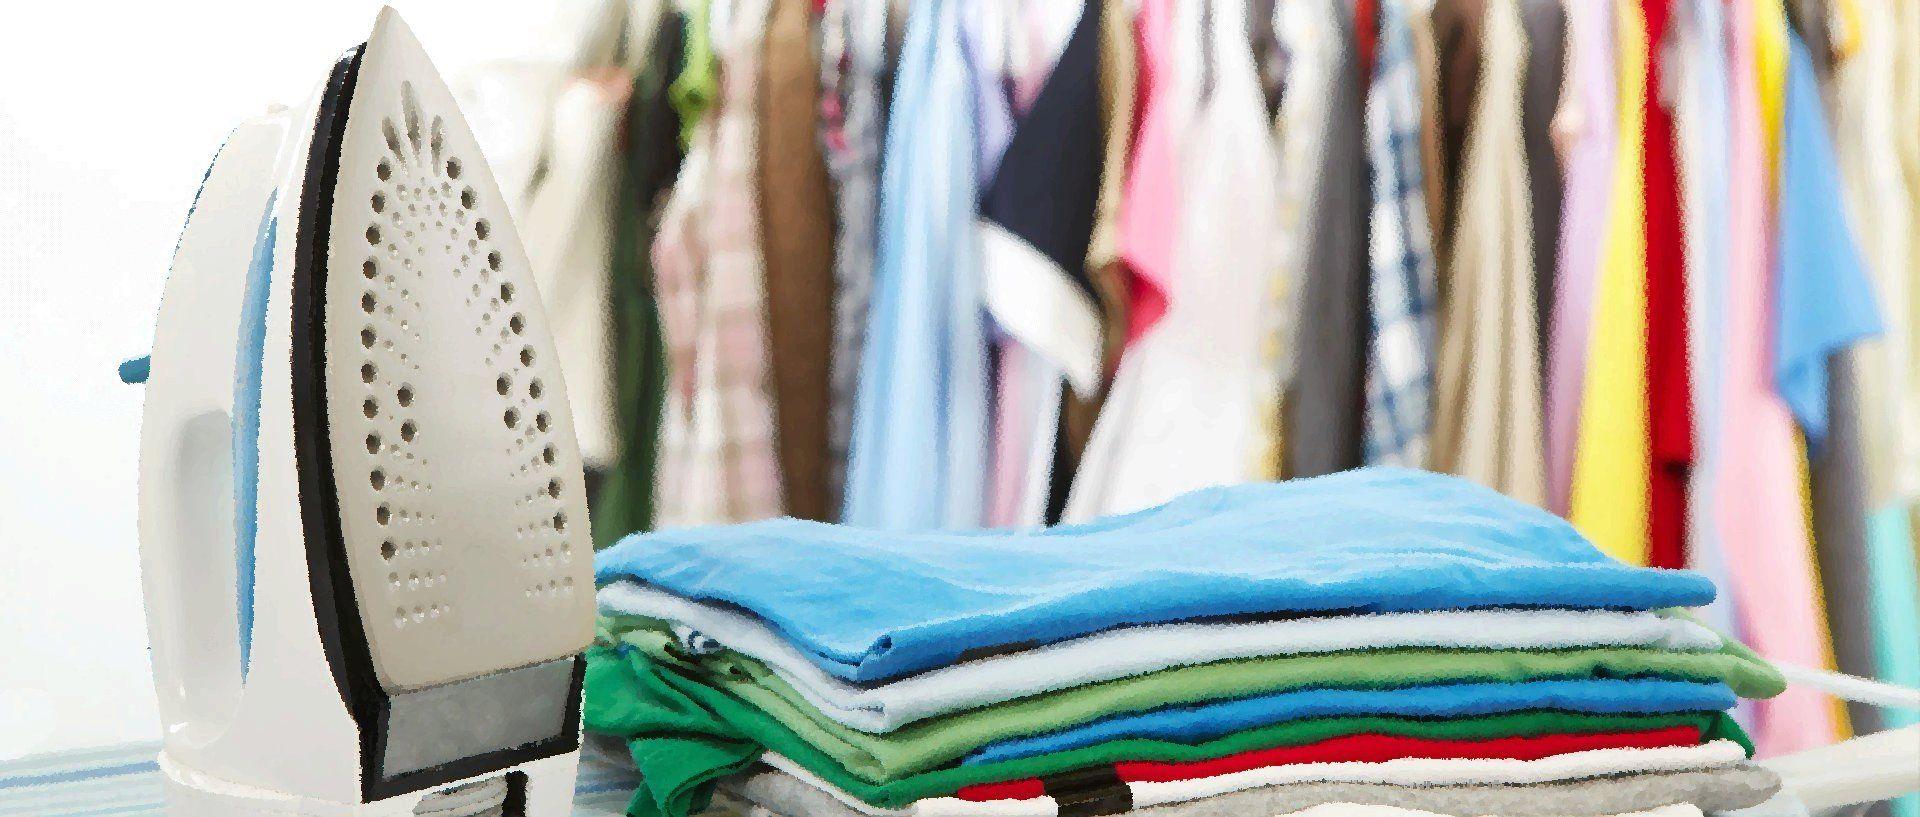 Washing and ironing things